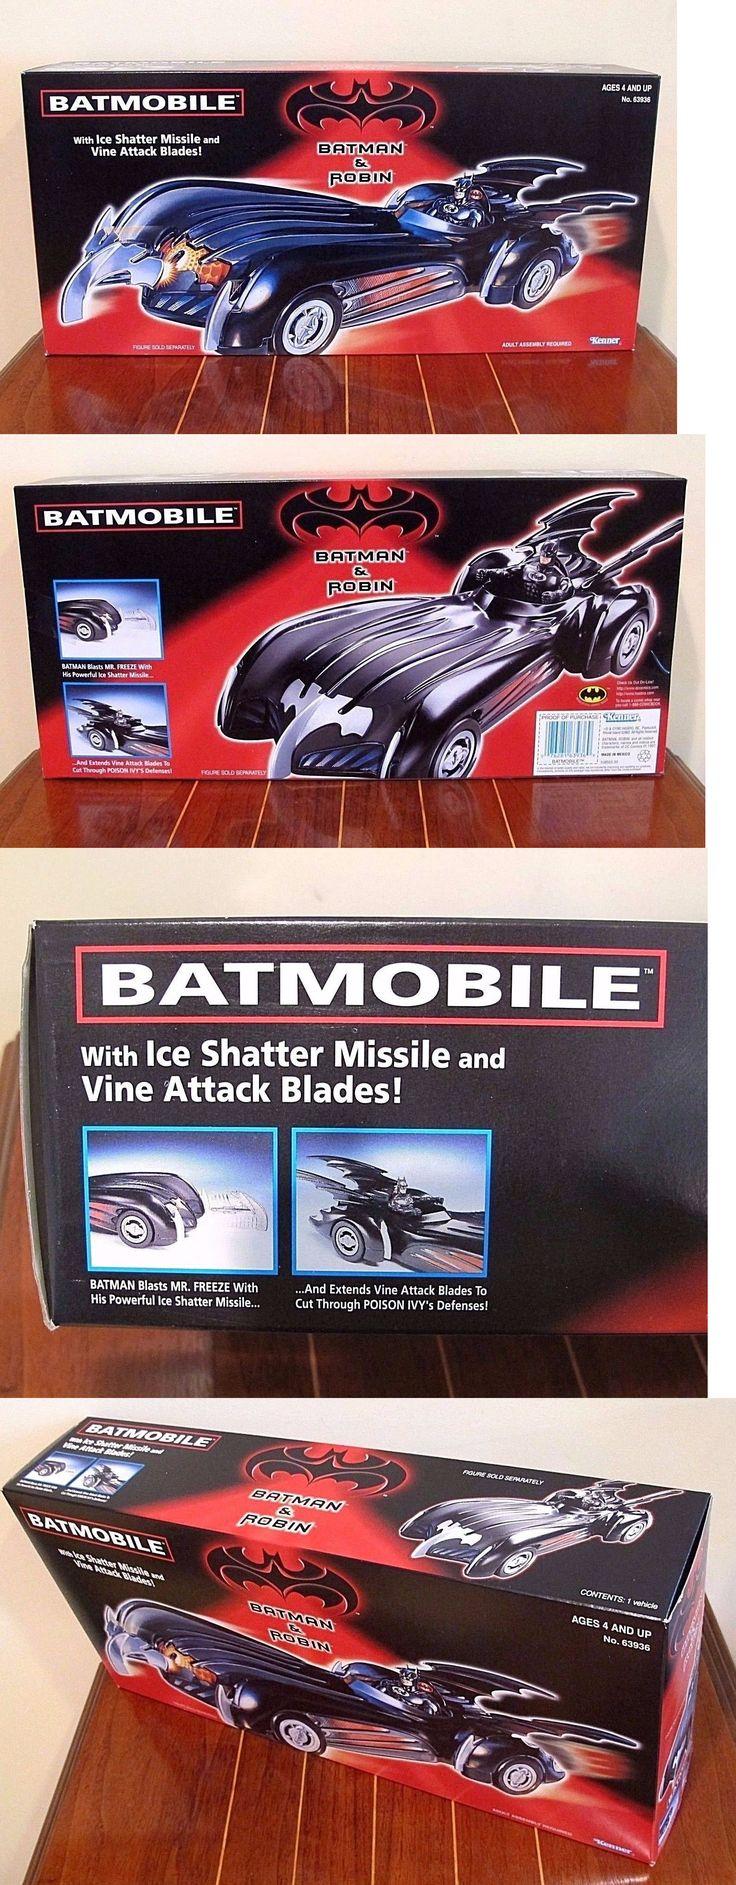 Batman 146023: Batmobile Batman And Robin Movie, New! Mib, Sealed, 1997, Kenner -> BUY IT NOW ONLY: $56 on eBay!